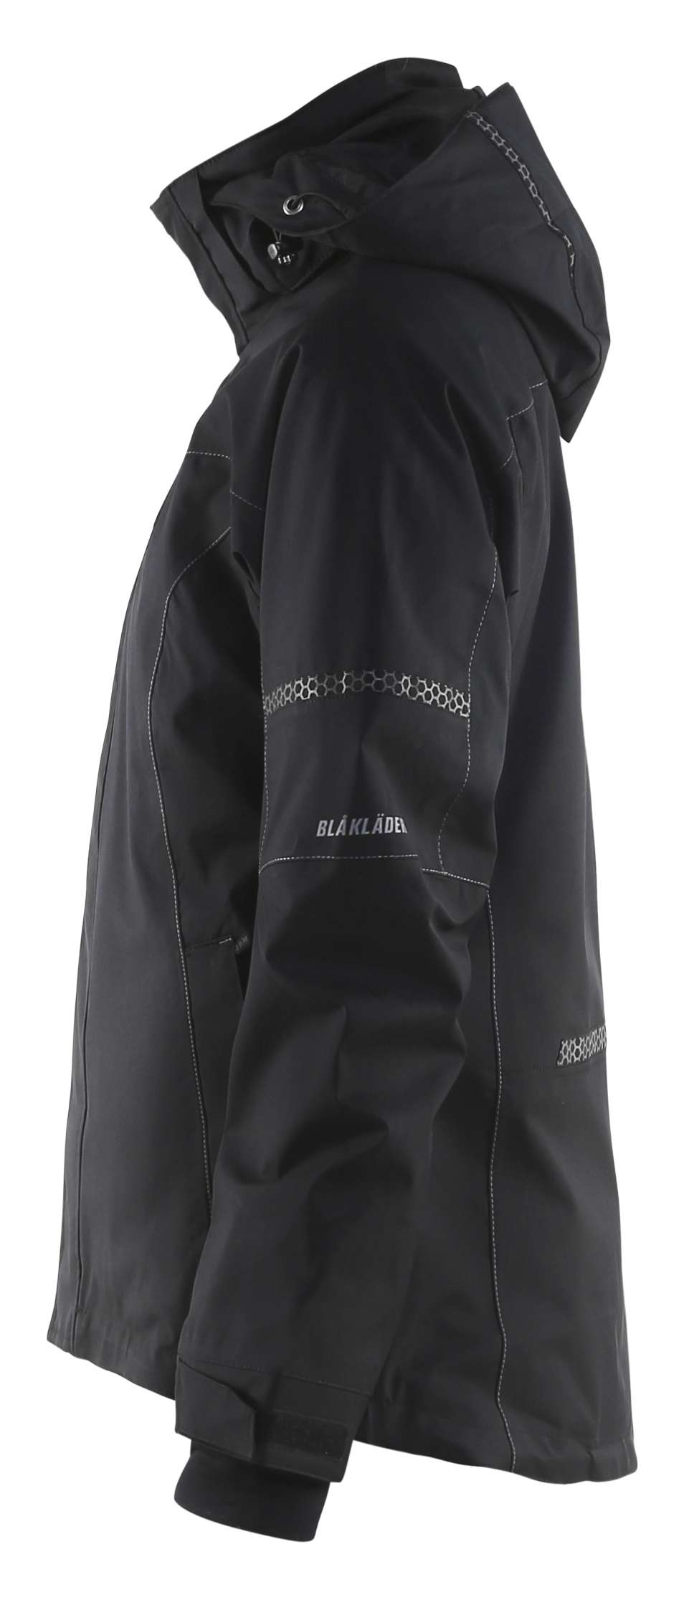 Blaklader Dames regenjacks 49081987 zwart(9900)